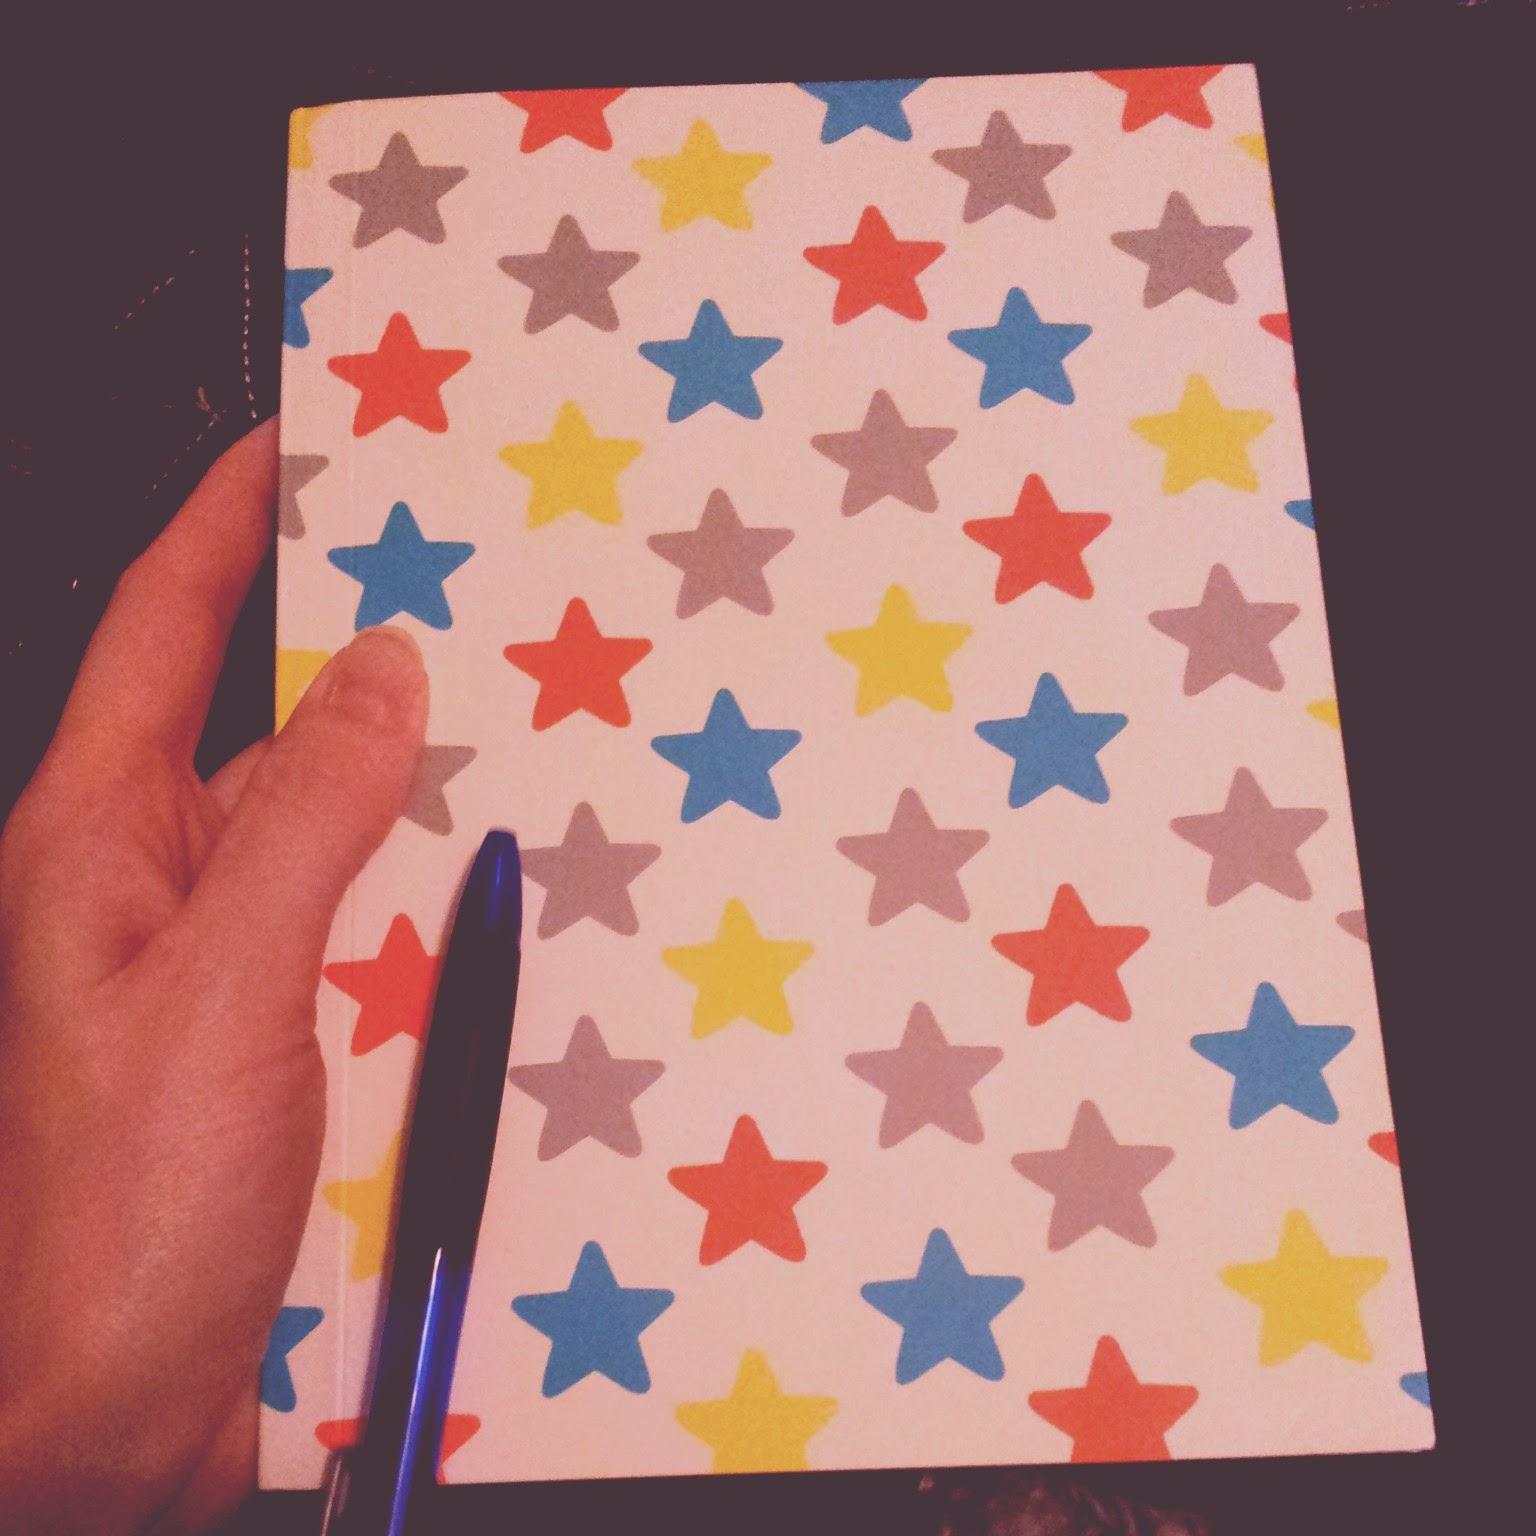 notebook wedding planning organiseren schrijven bruiloft plannen